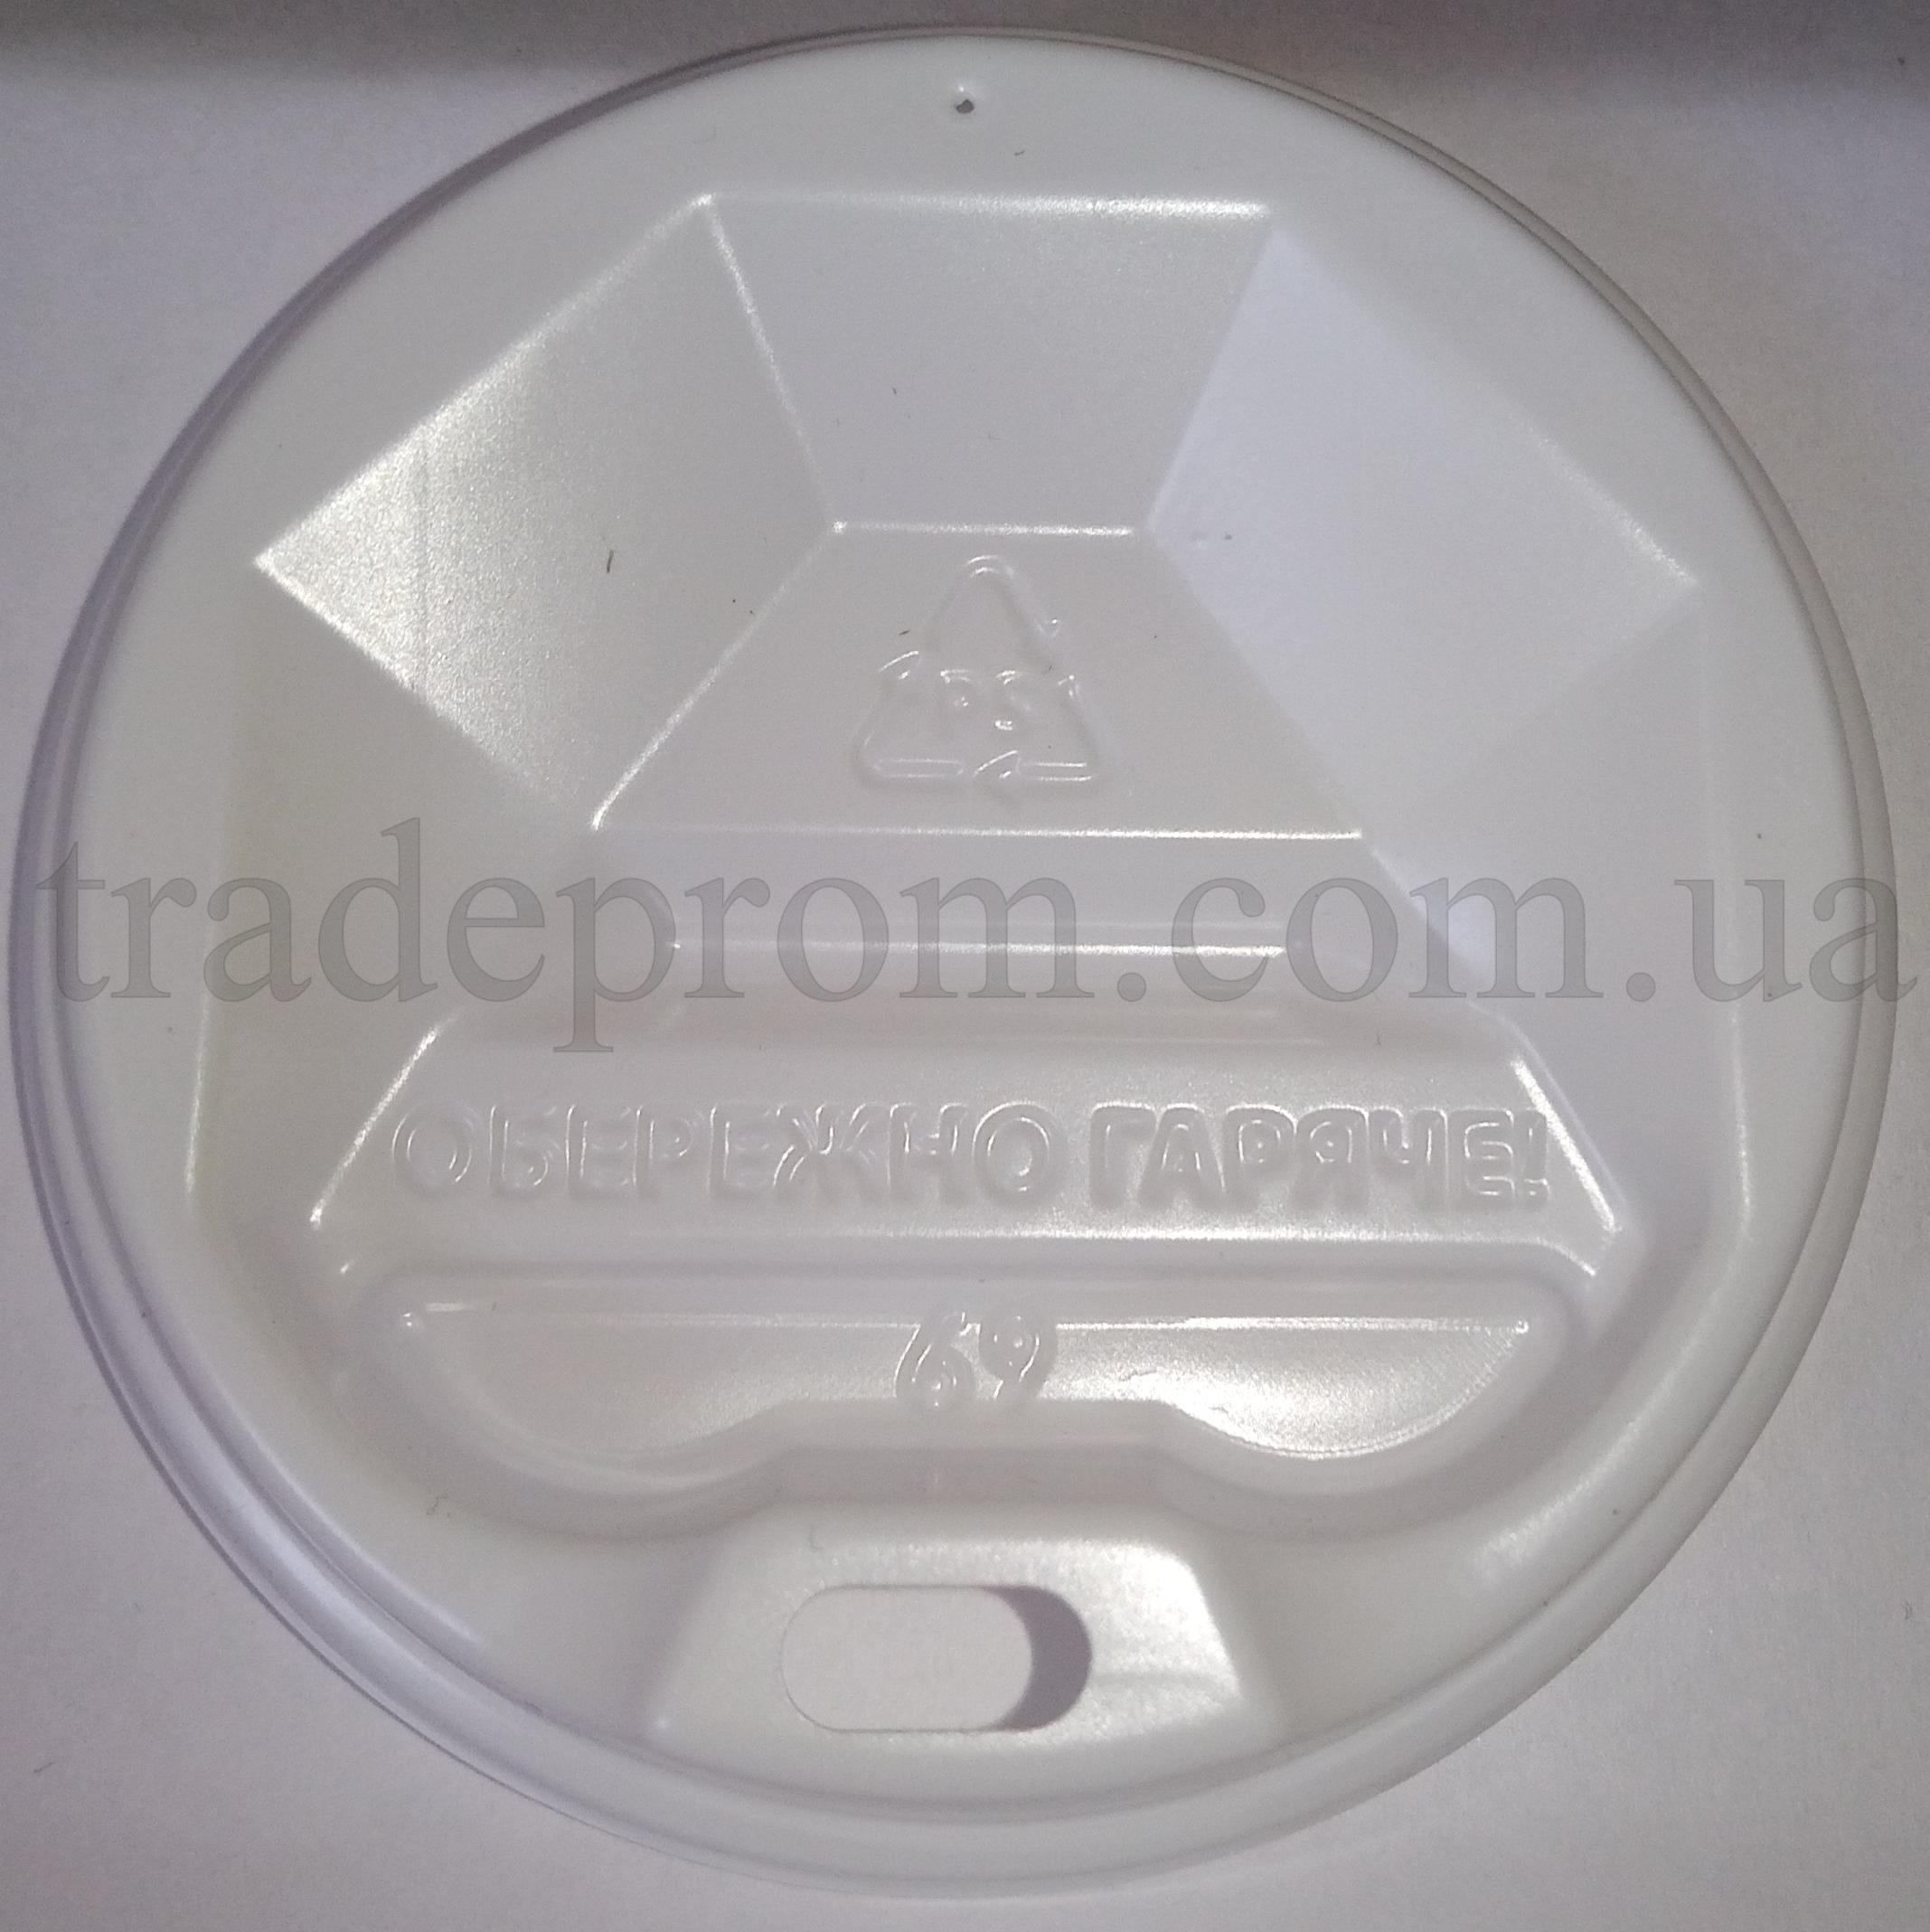 Кришка пластик U д/пап.стакана 69 (50 шт) біла